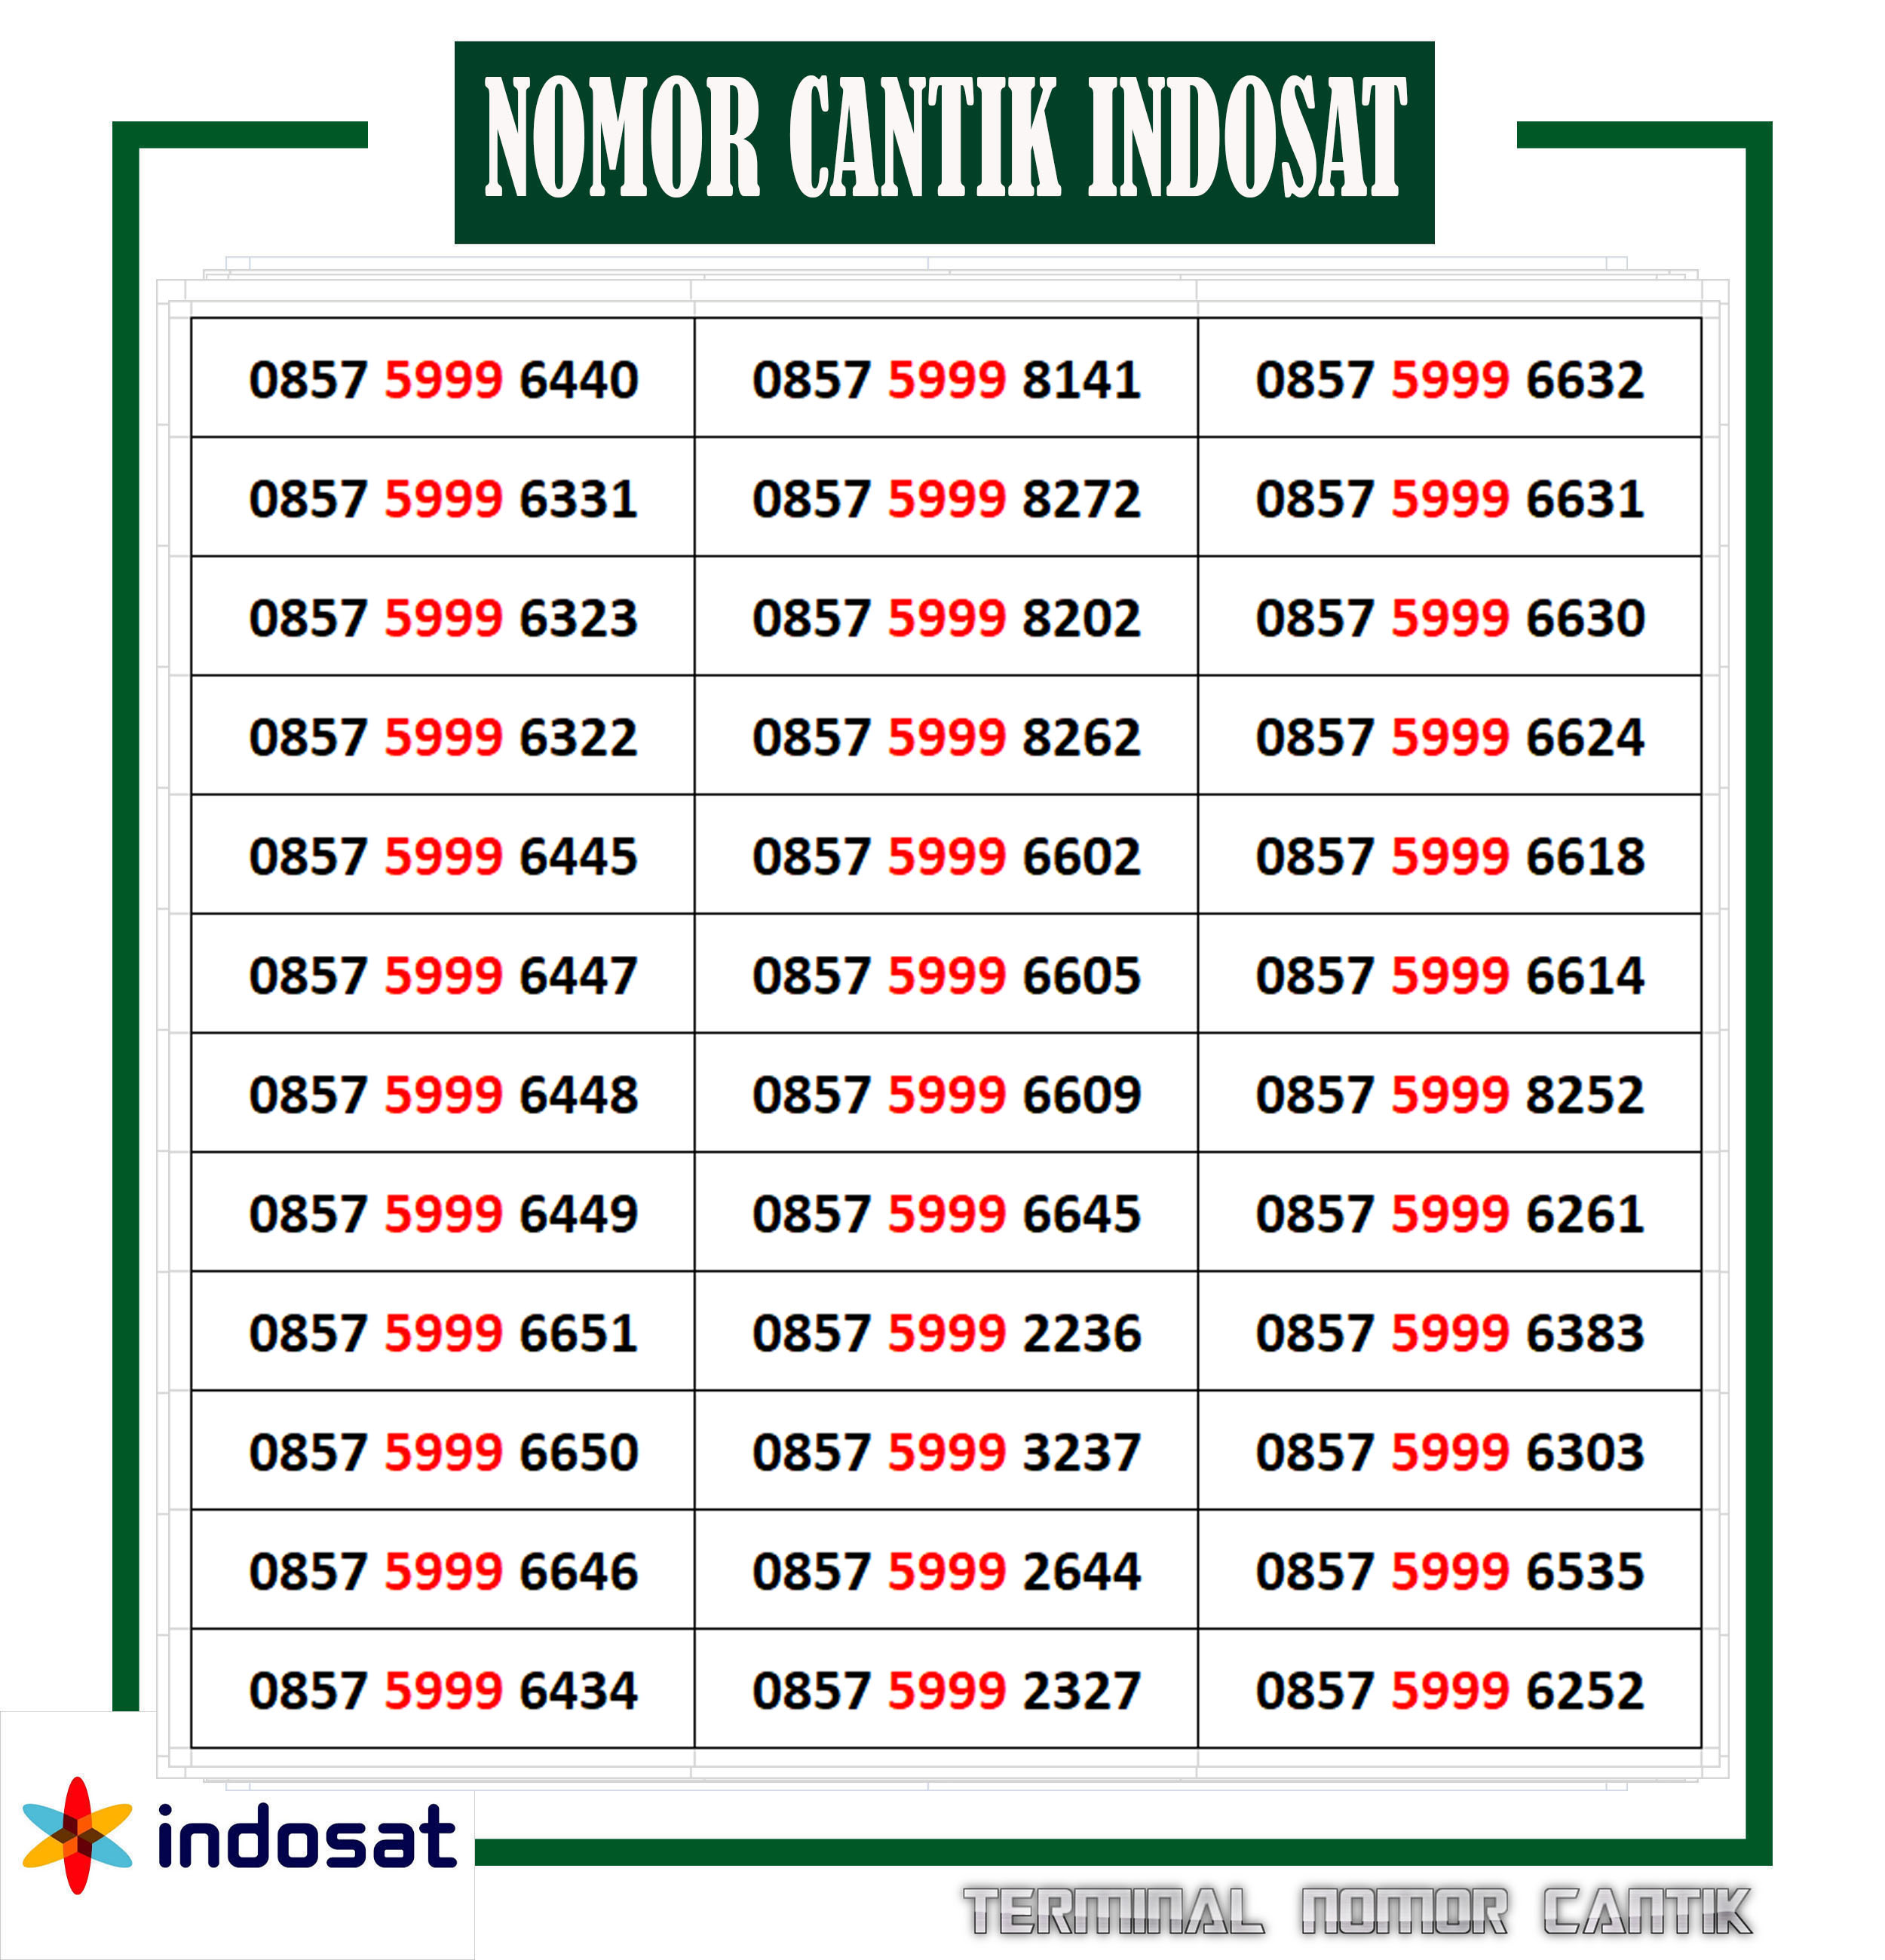 [cod] nomor cantik kartu indosat oreedoo nocan 4g lte  rapih  999